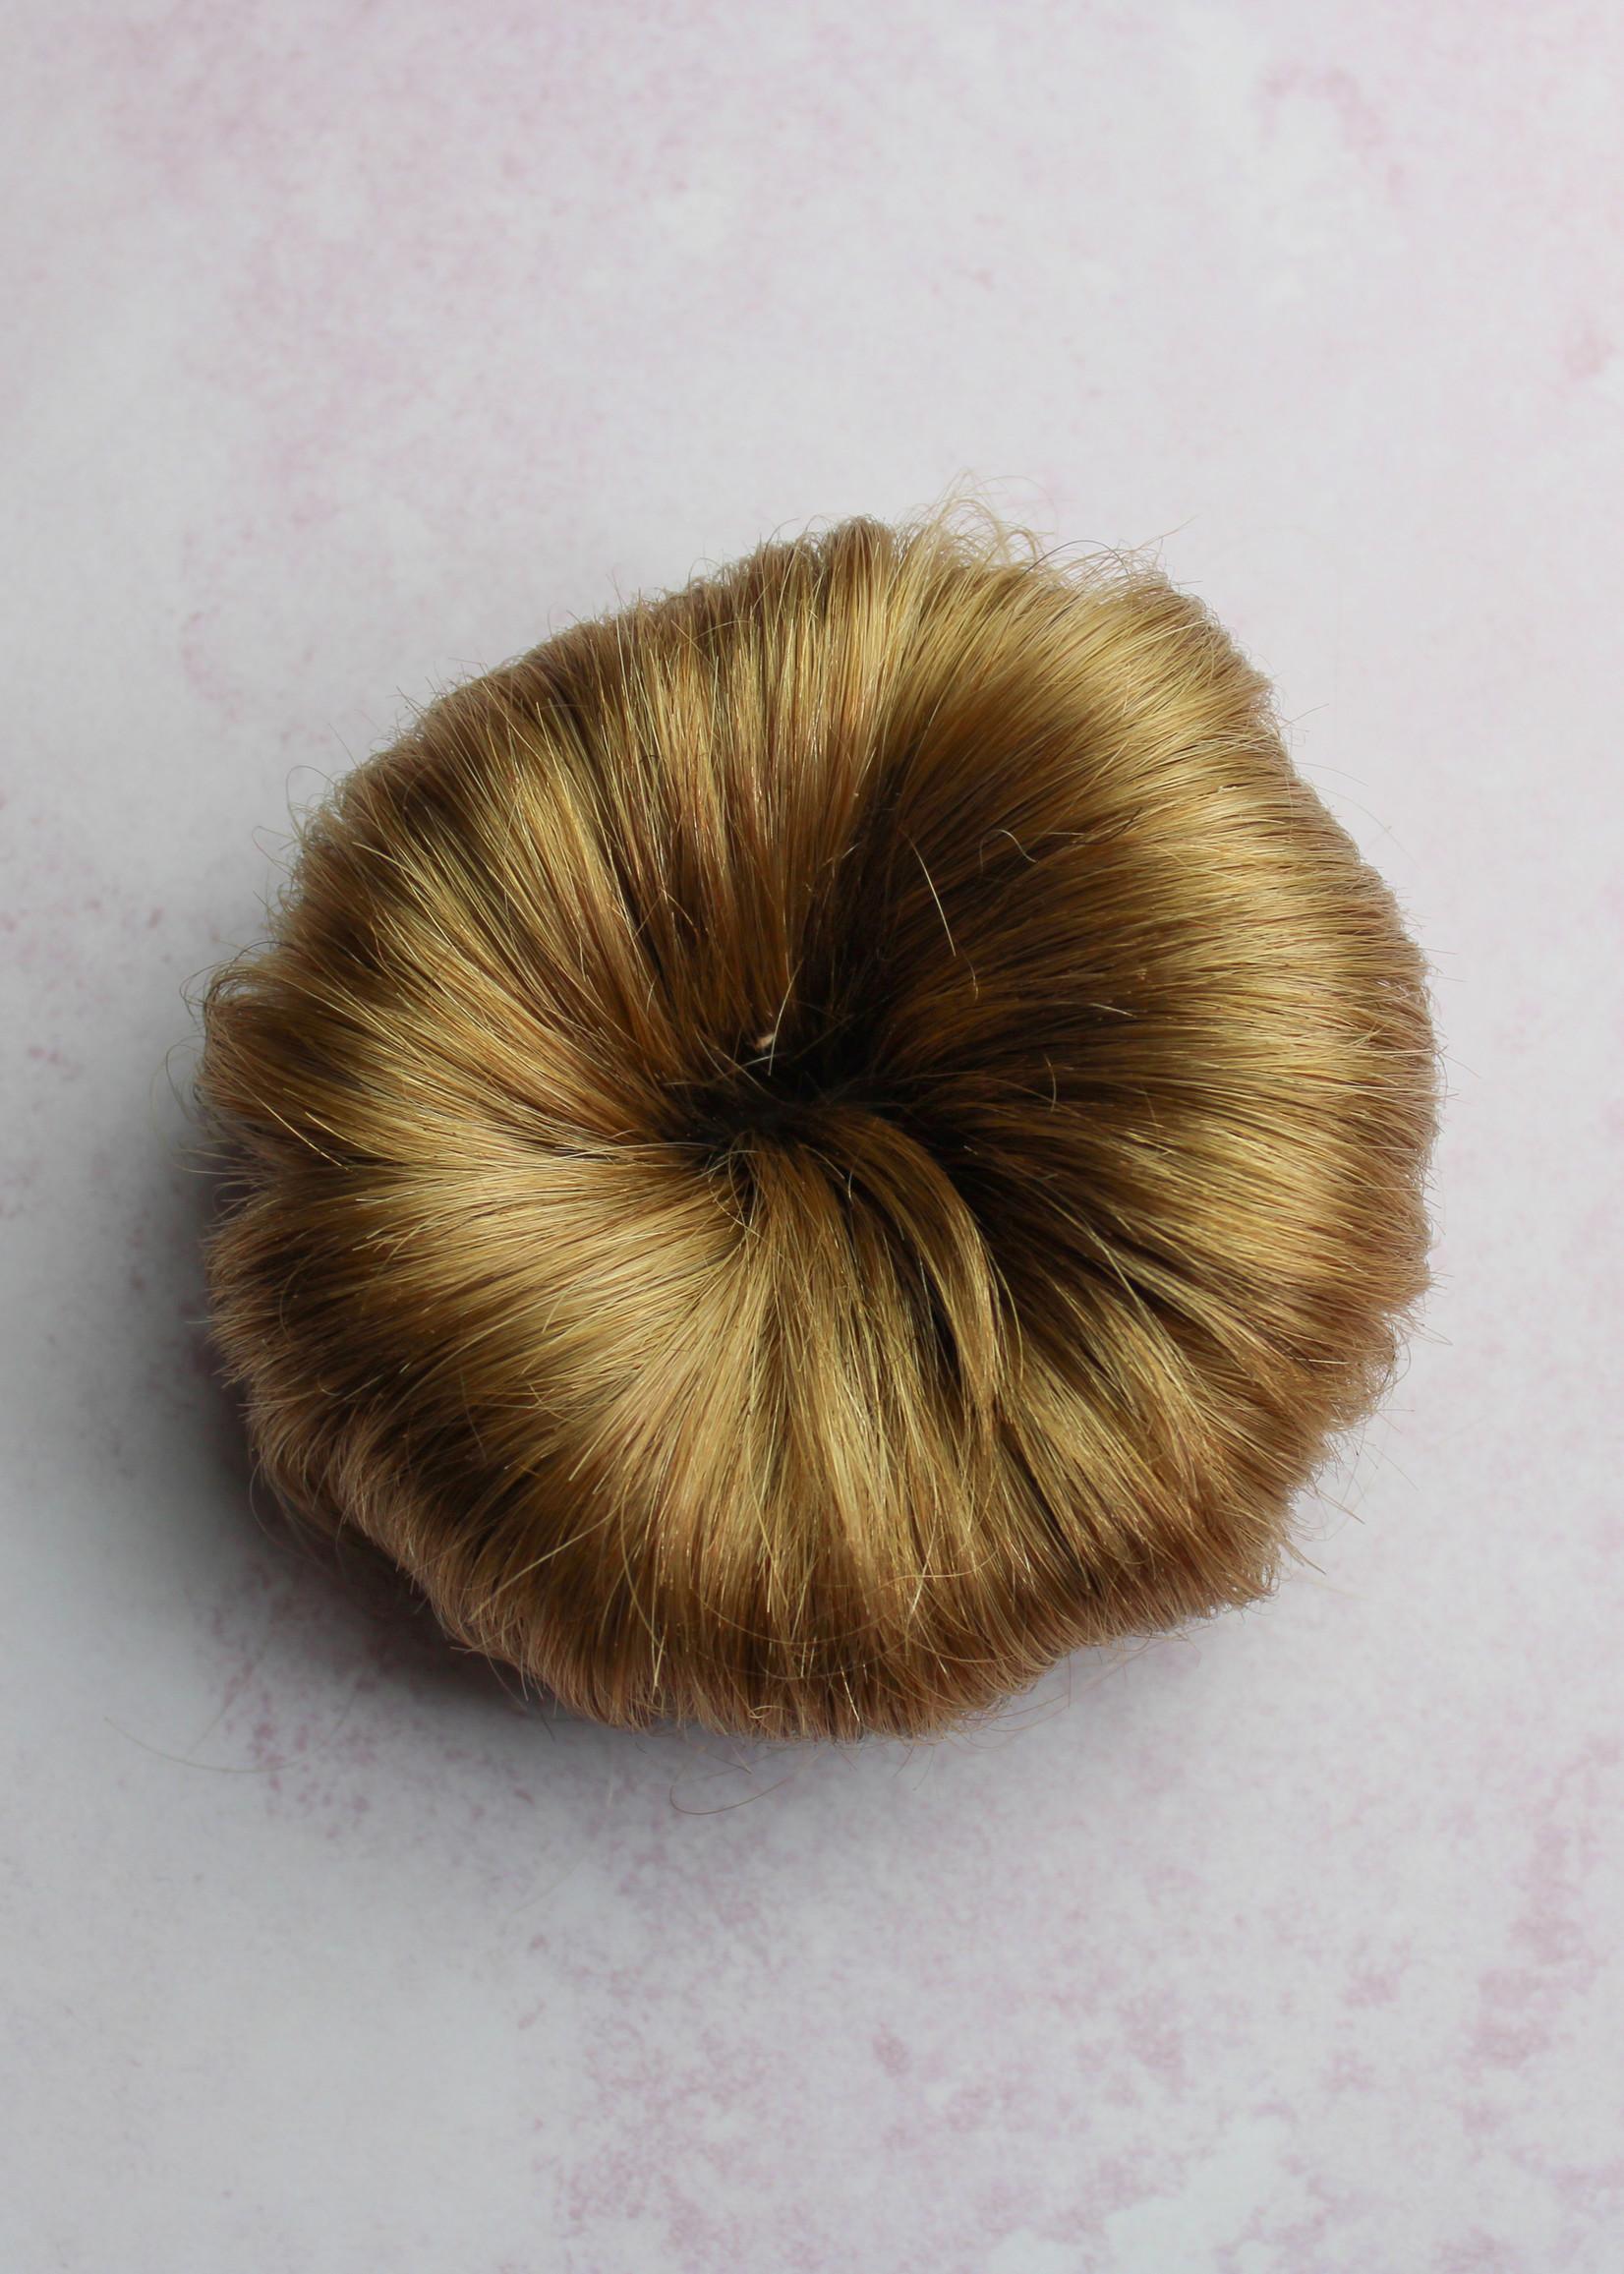 Human Hair Buns - Color 8